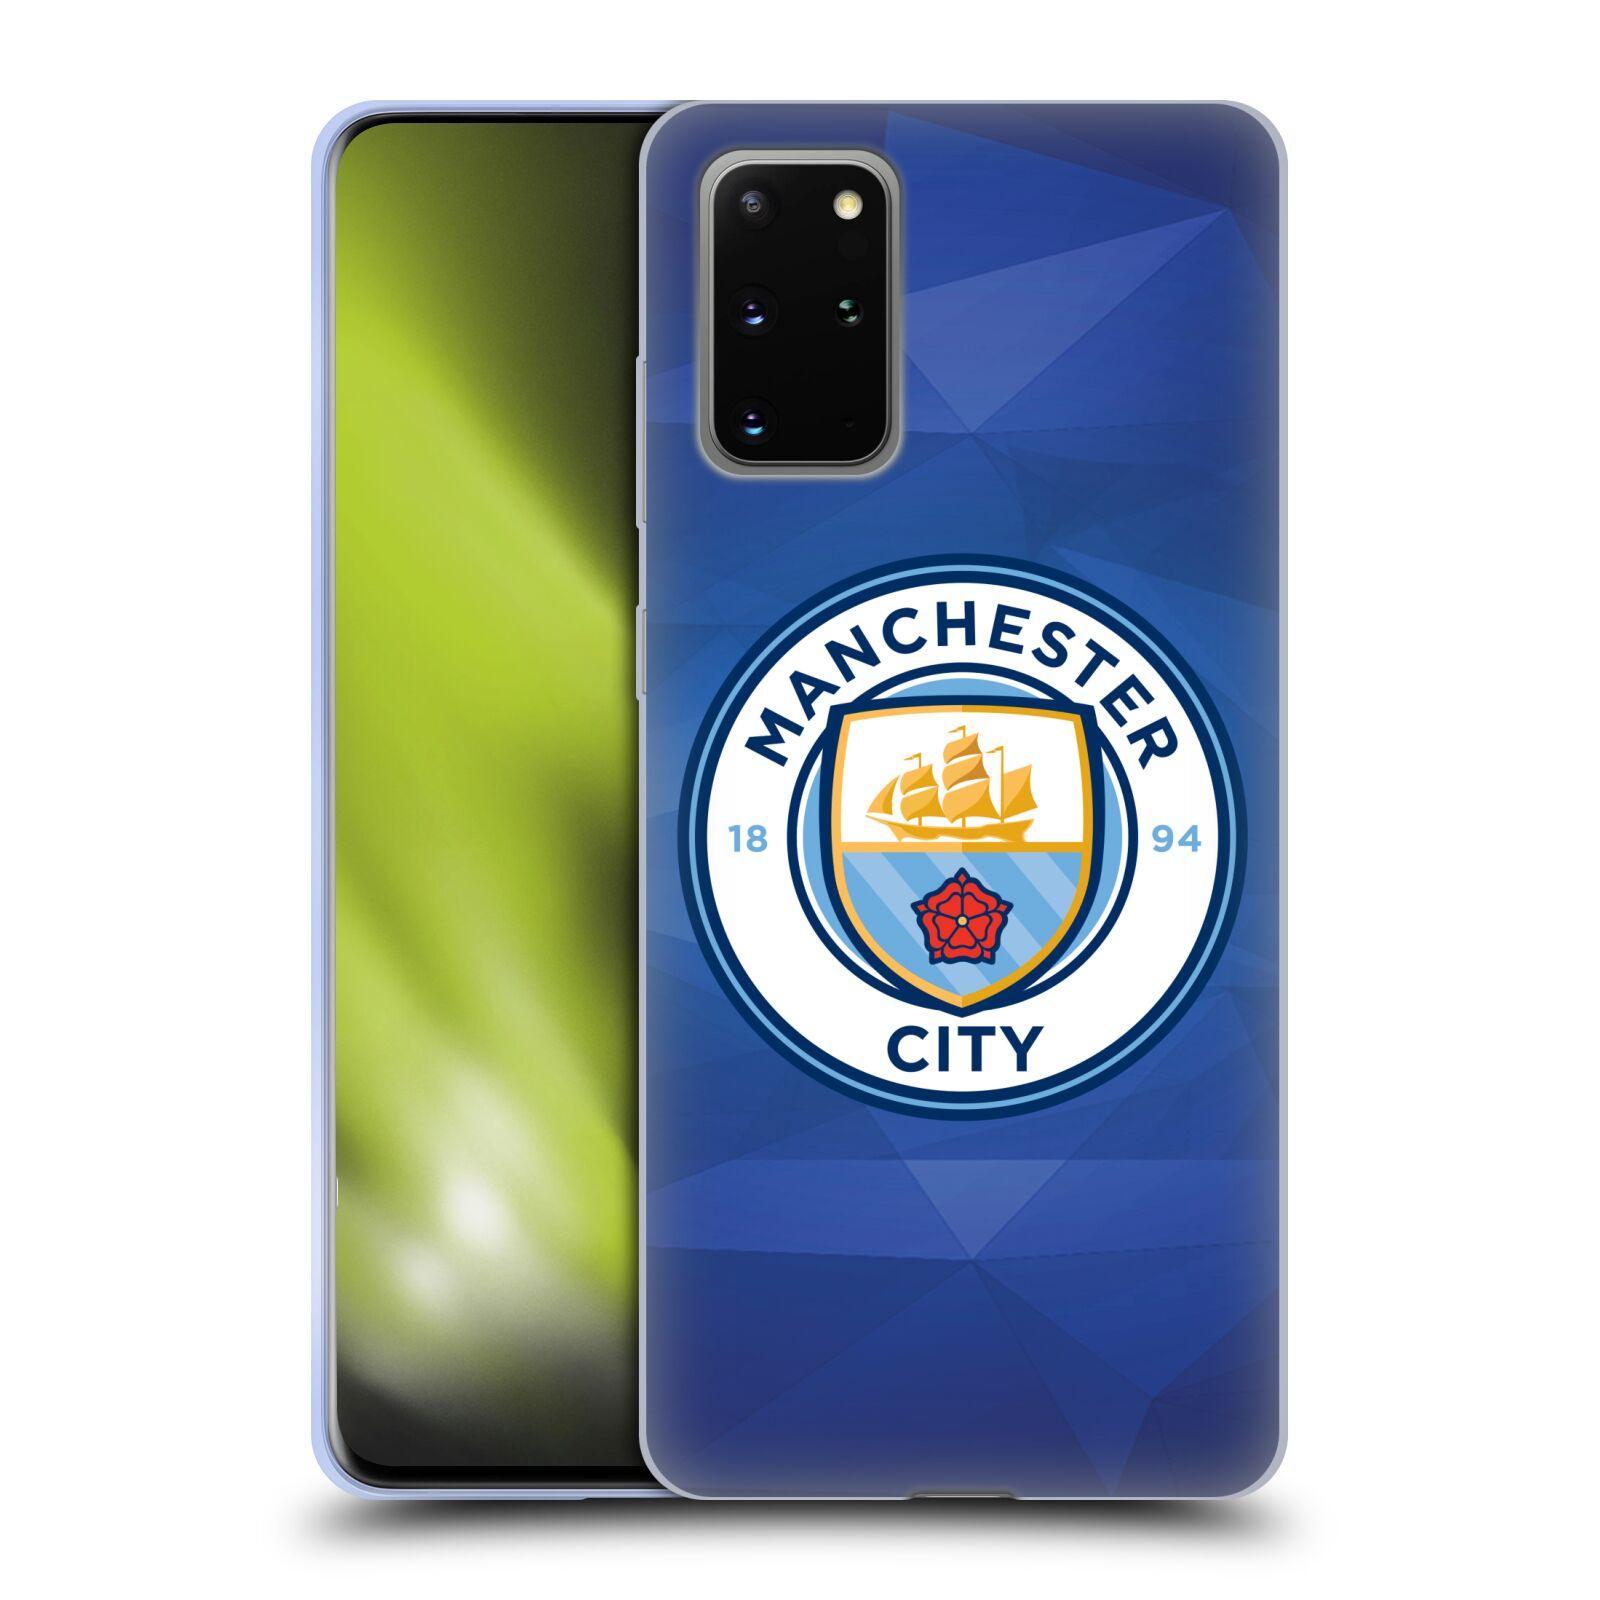 Silikonové pouzdro na mobil Samsung Galaxy S20 Plus - Head Case - Manchester City FC - Modré nové logo